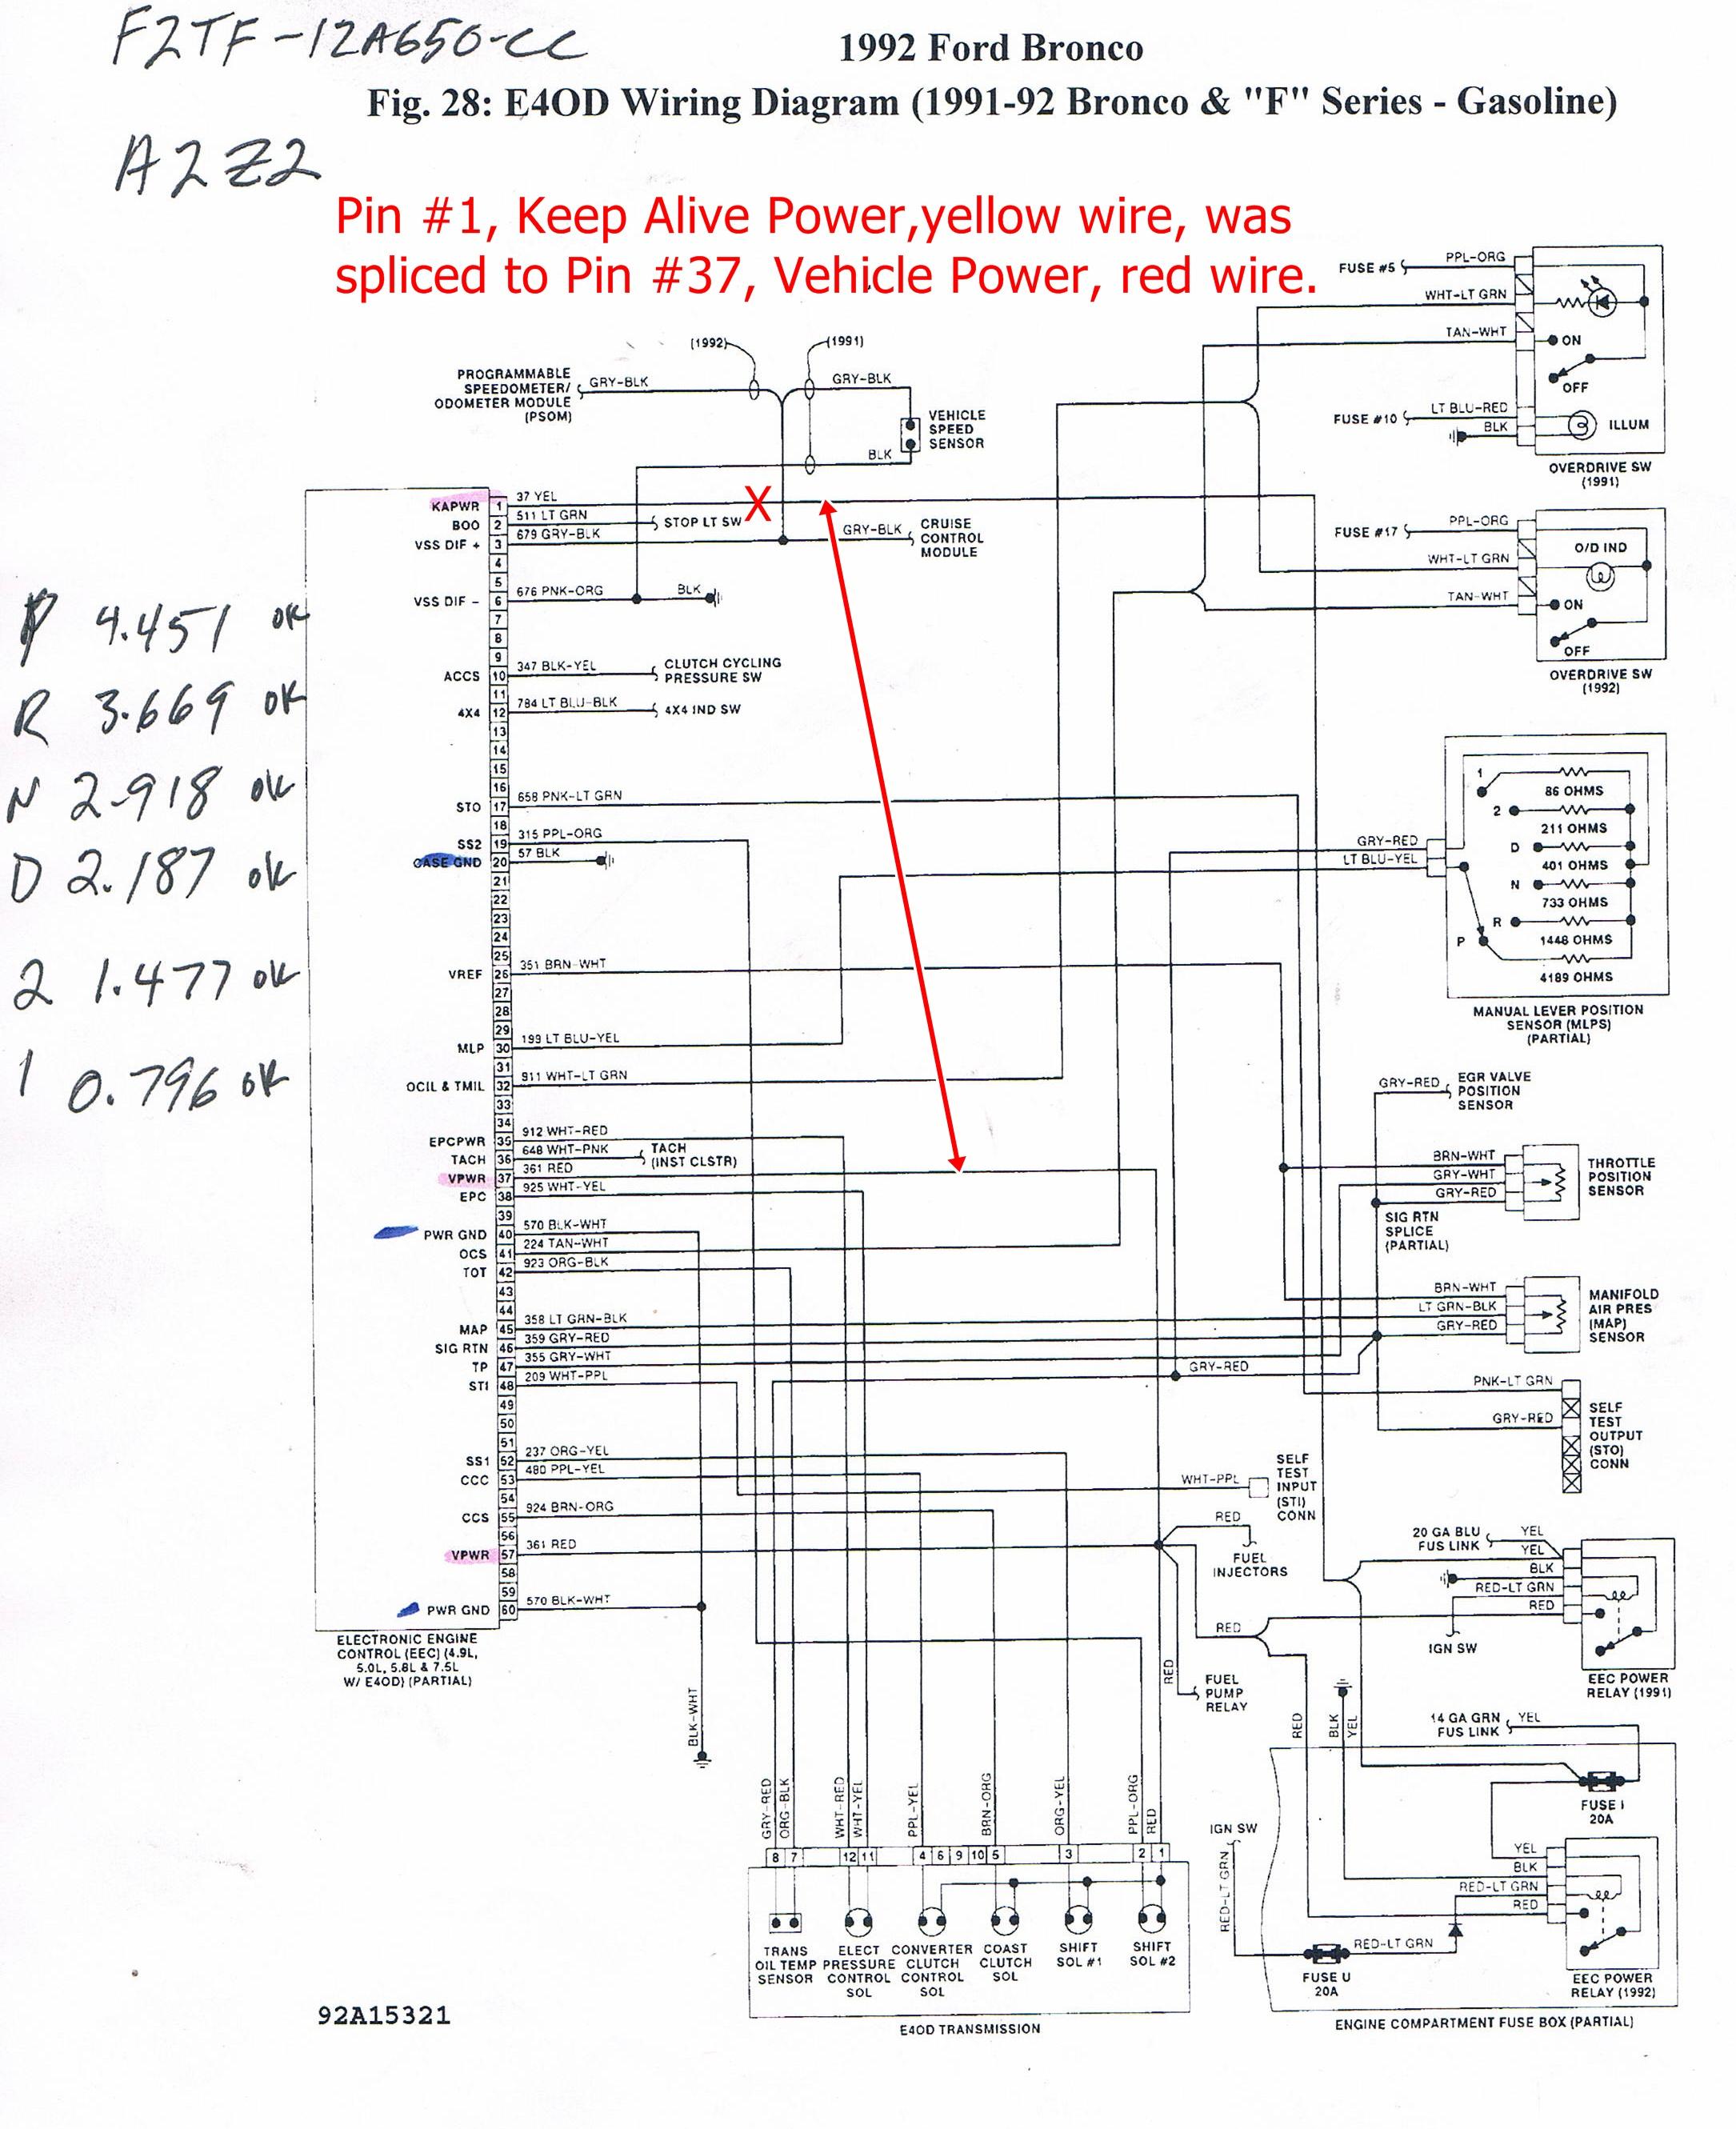 Lexus Rx300 Radio Wiring Diagram | Wiring Library - Harley Davidson Headlight Wiring Diagram